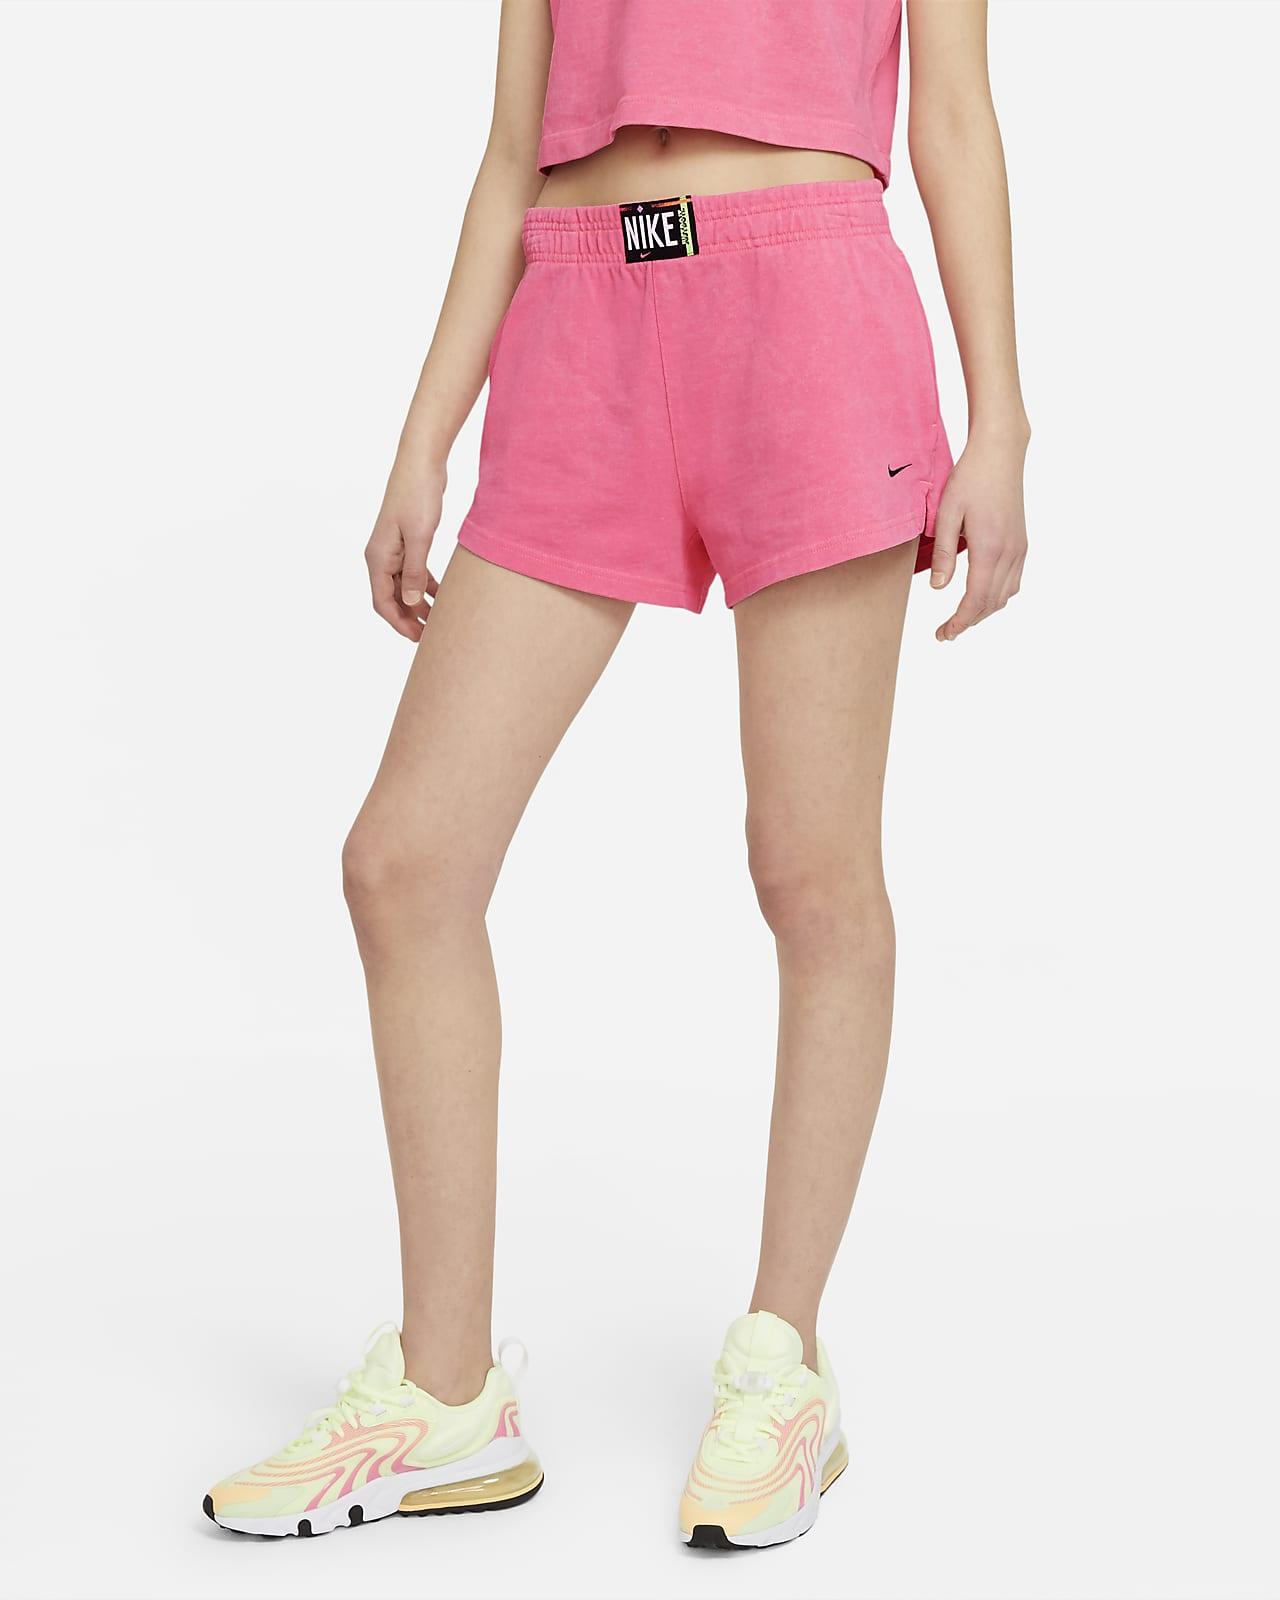 Shorts para mujer Nike Sportswear